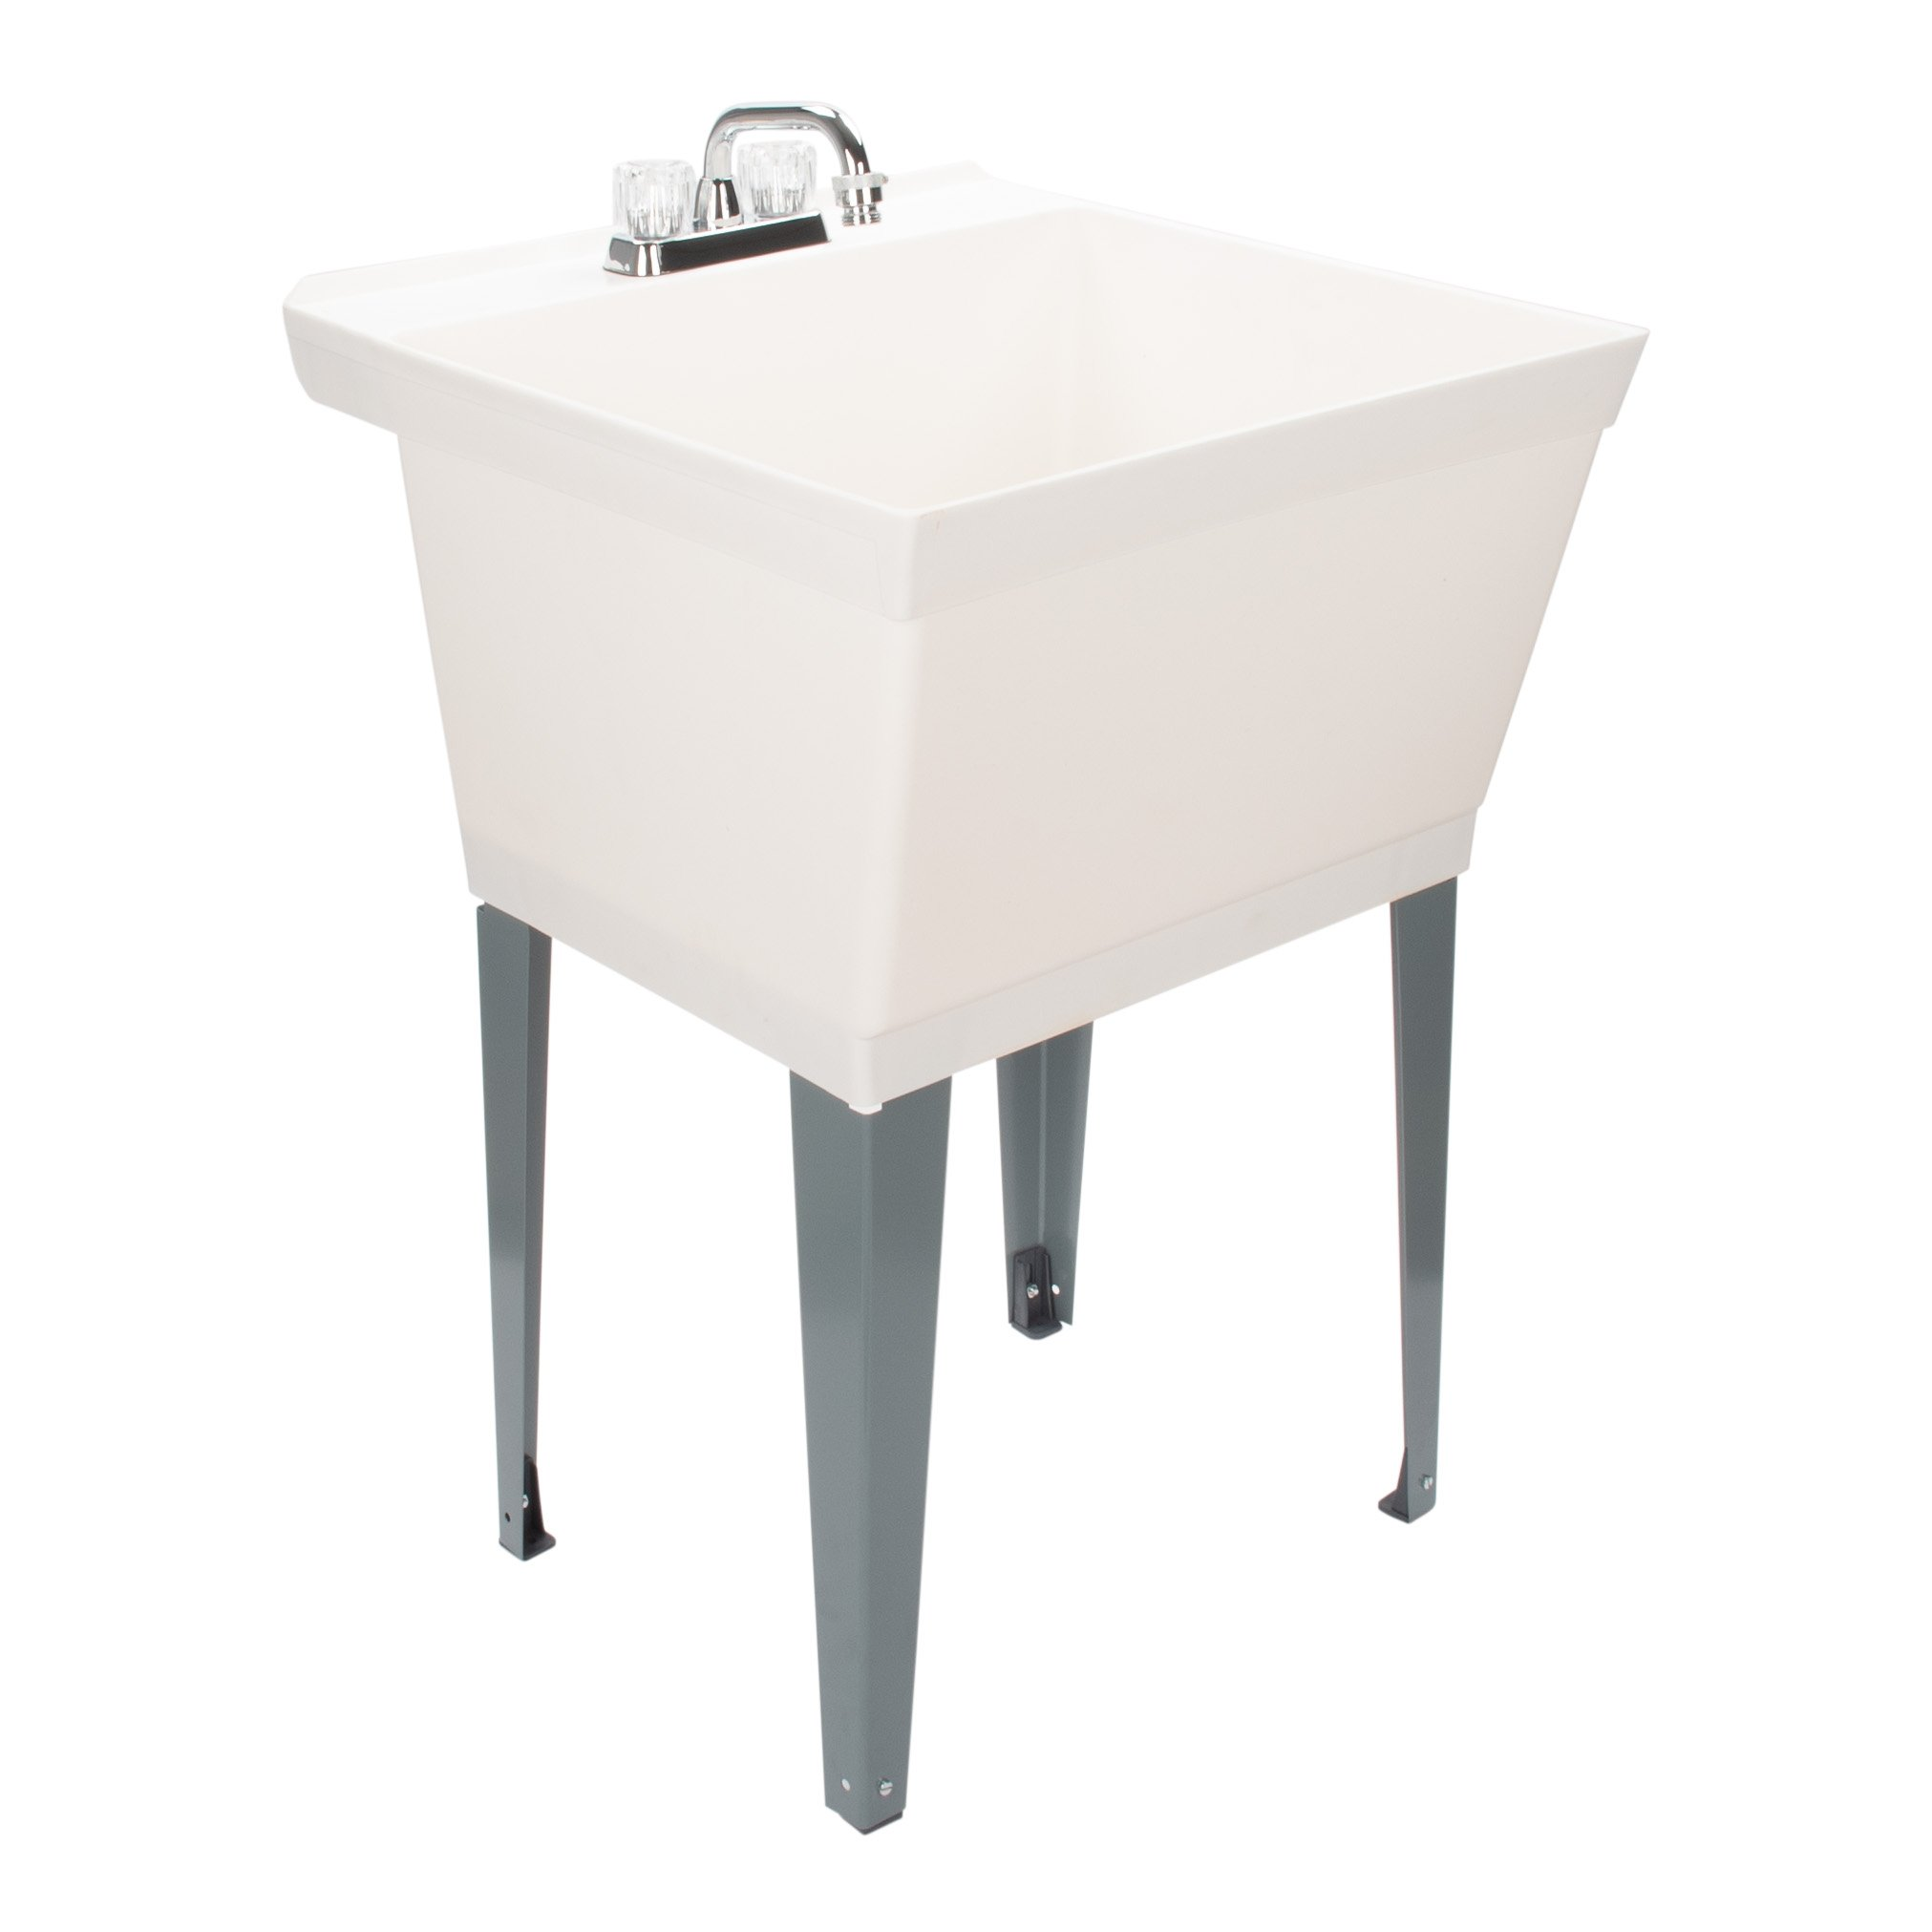 LDR Industries 405000 040 5000 Utility Sink, White